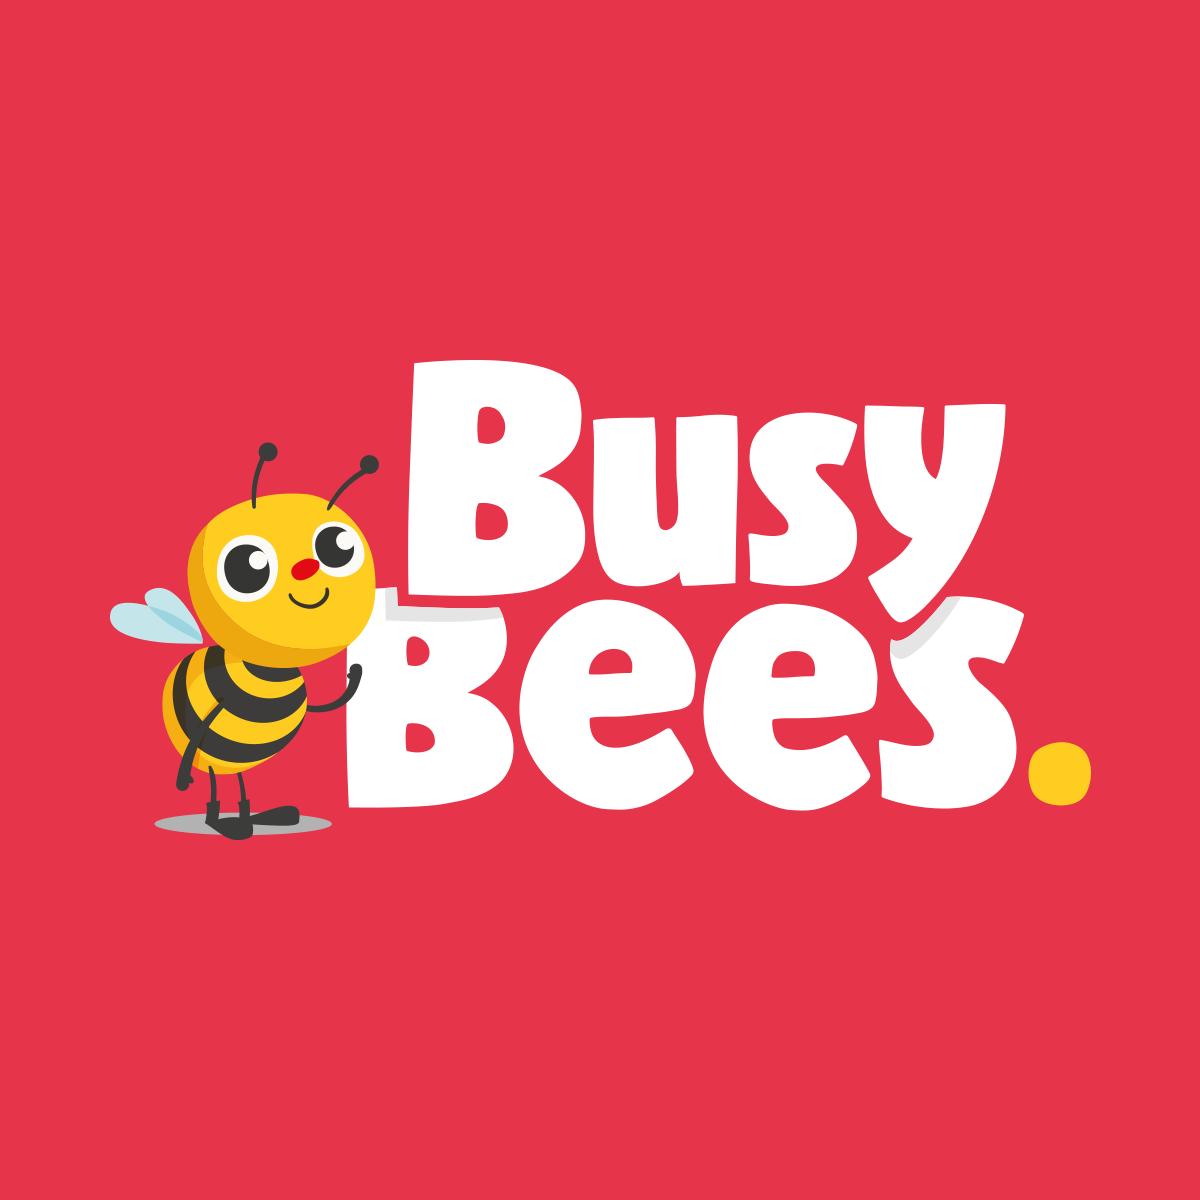 (c) Busybeestraining.co.uk